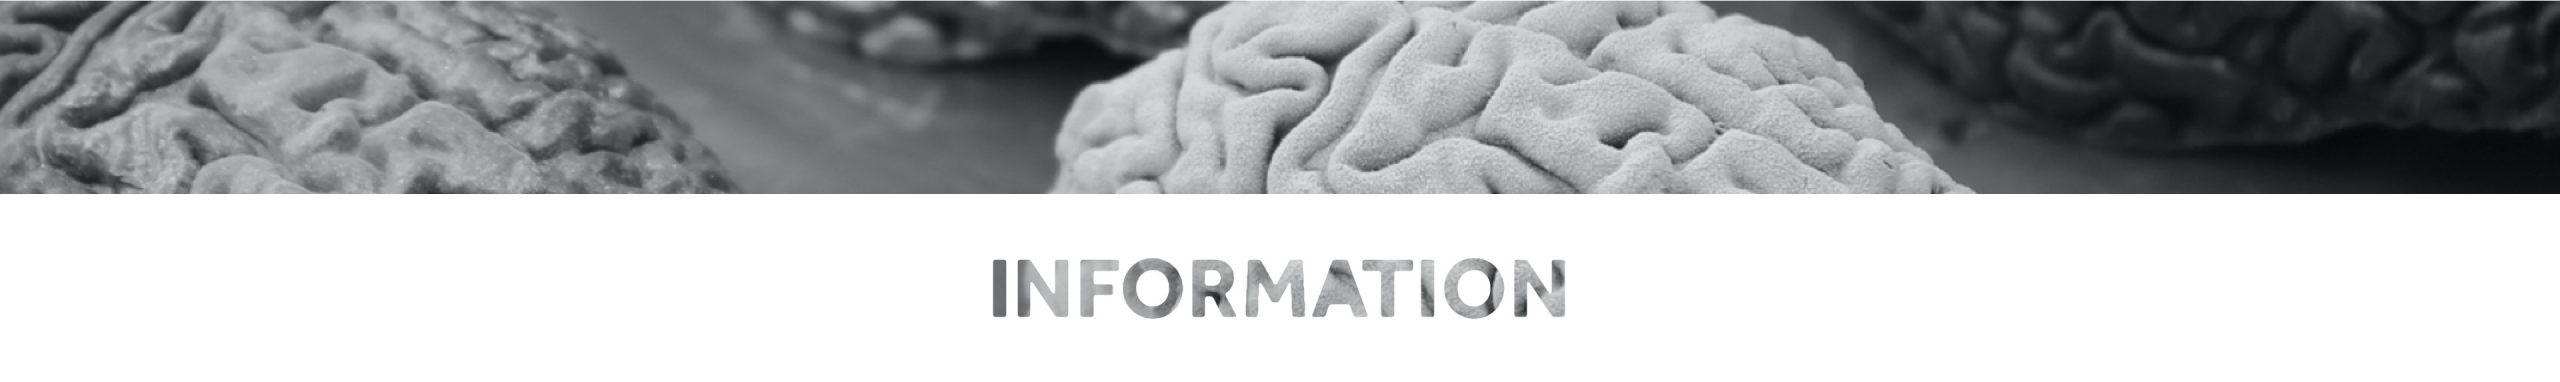 Information   Science   Brain